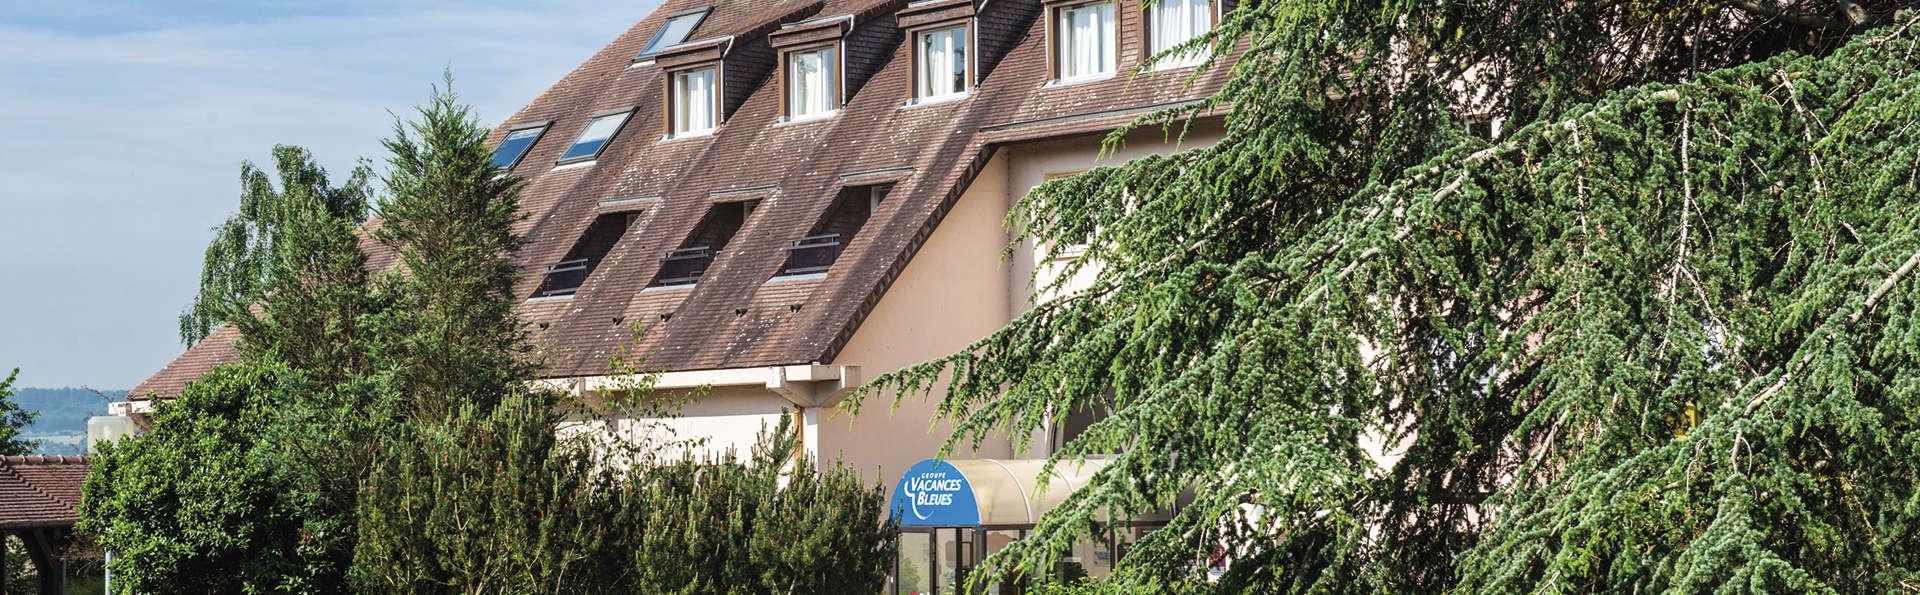 Hotel Des Ventes Saint Die